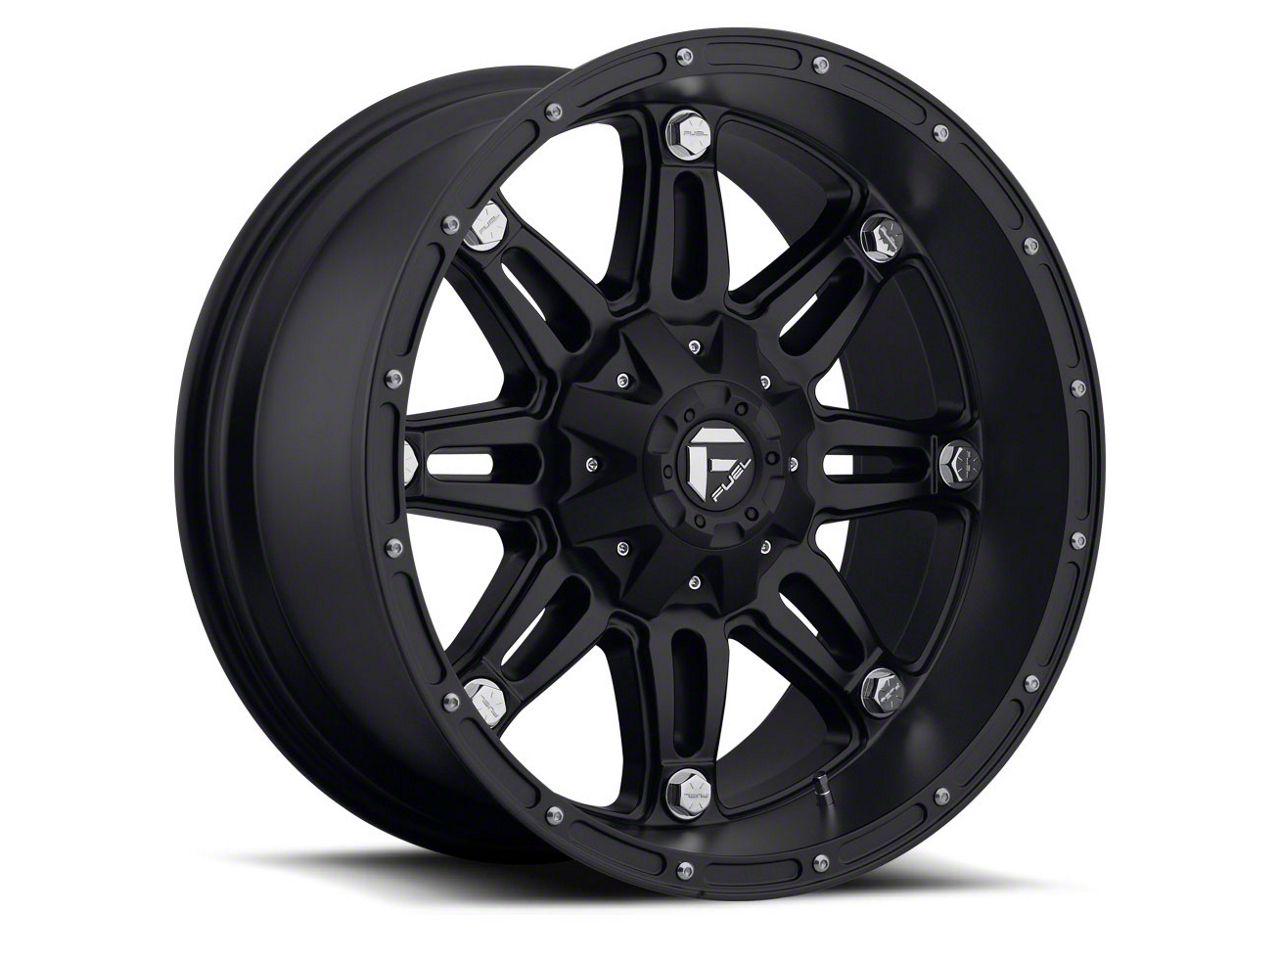 Fuel Wheels Hostage Matte Black 6-Lug Wheel - 20x14 (04-18 F-150)